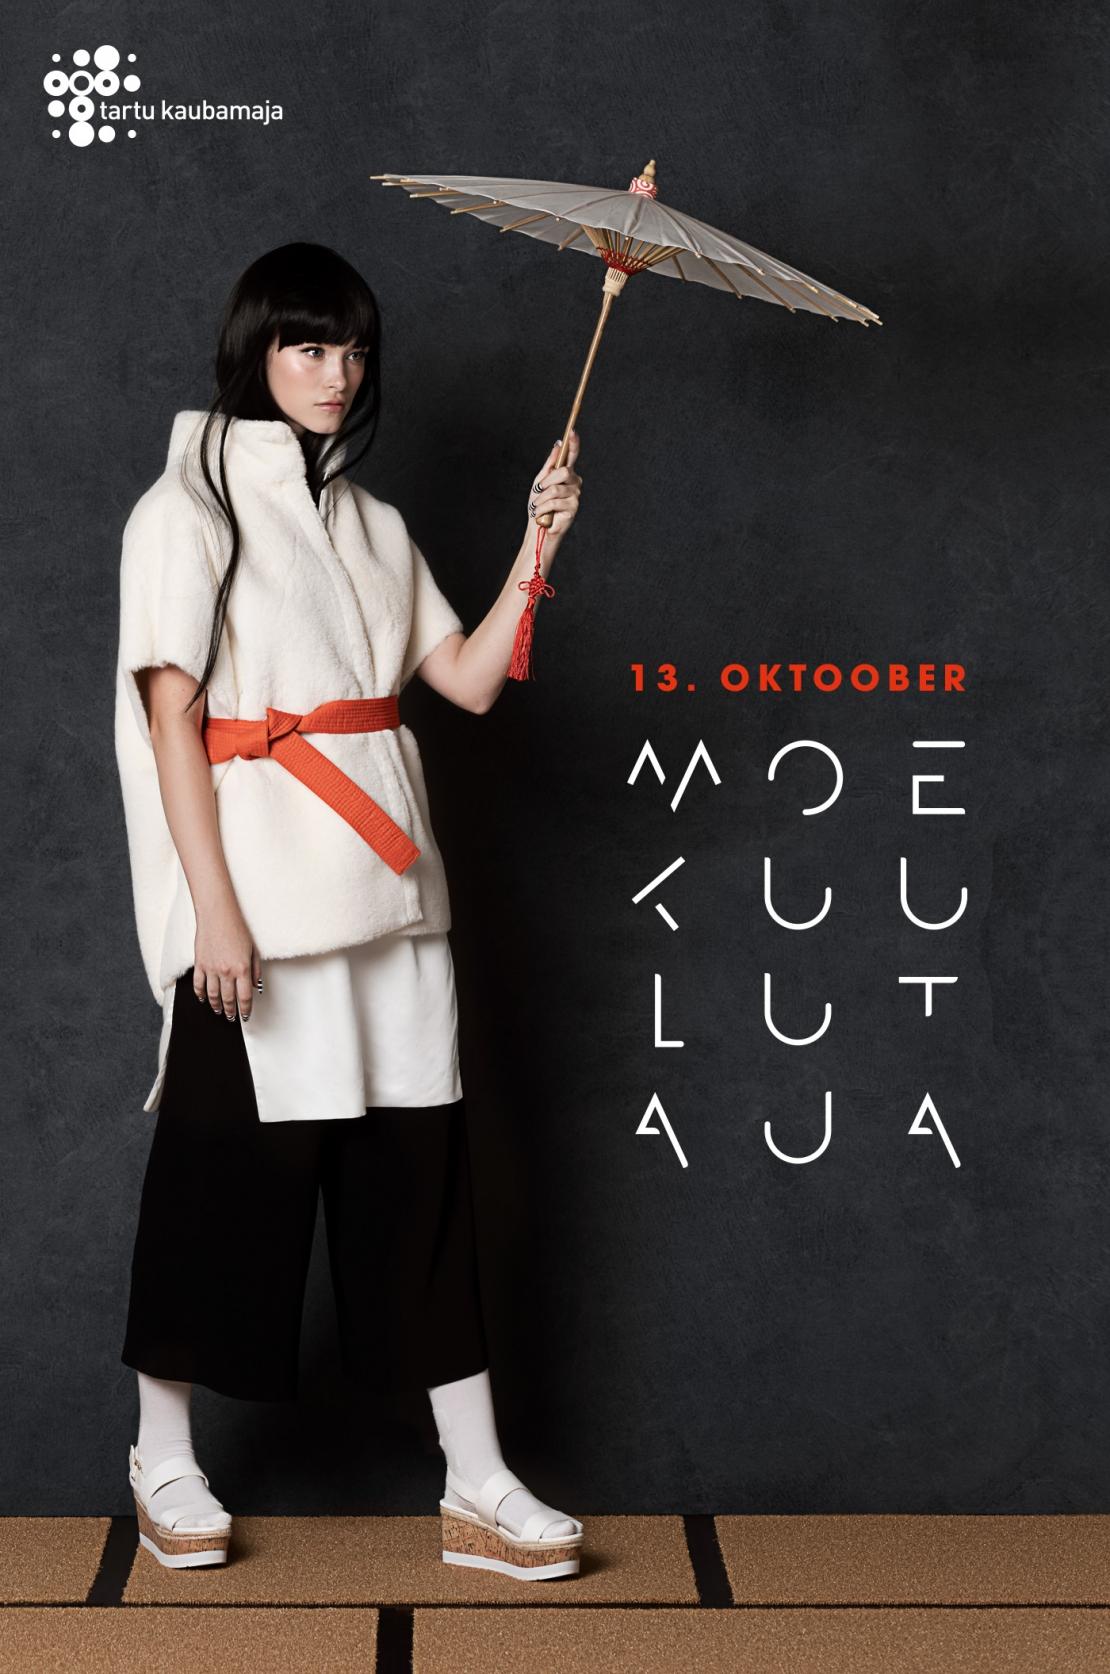 Tartu Kaubamaja – Moekuulutaja Autumn '18